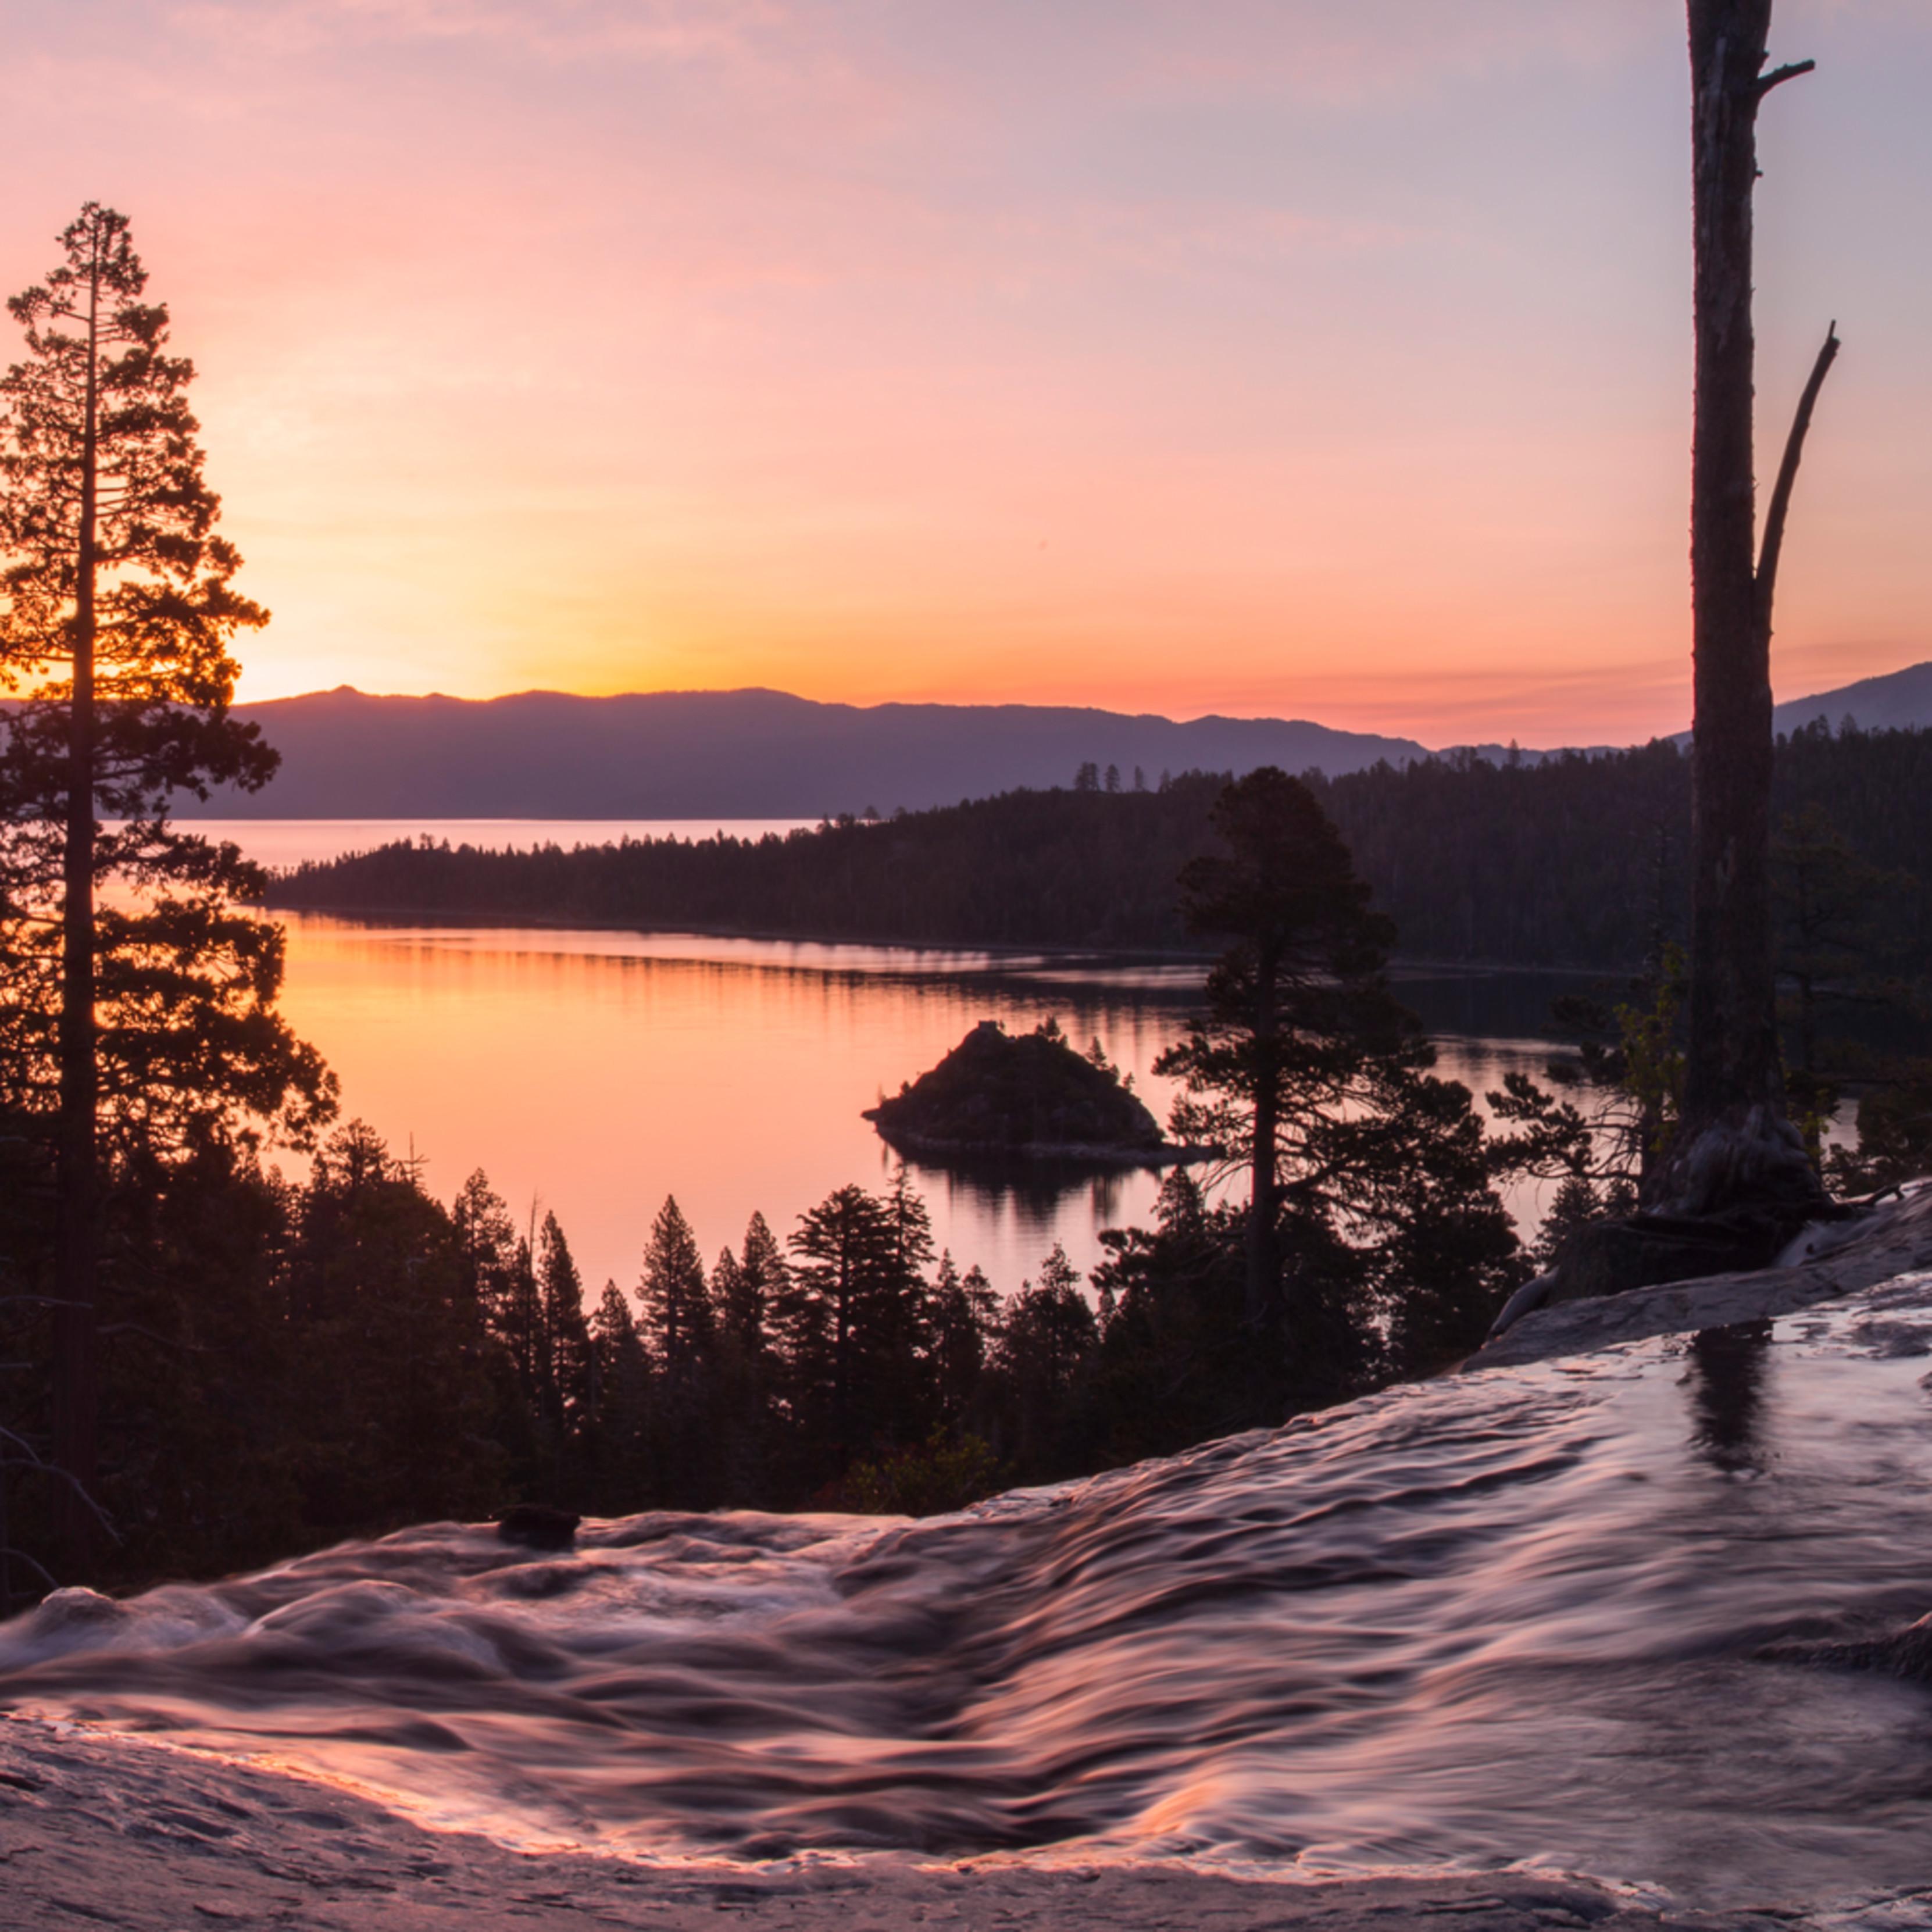 Eagle falls sunrise warm picypw